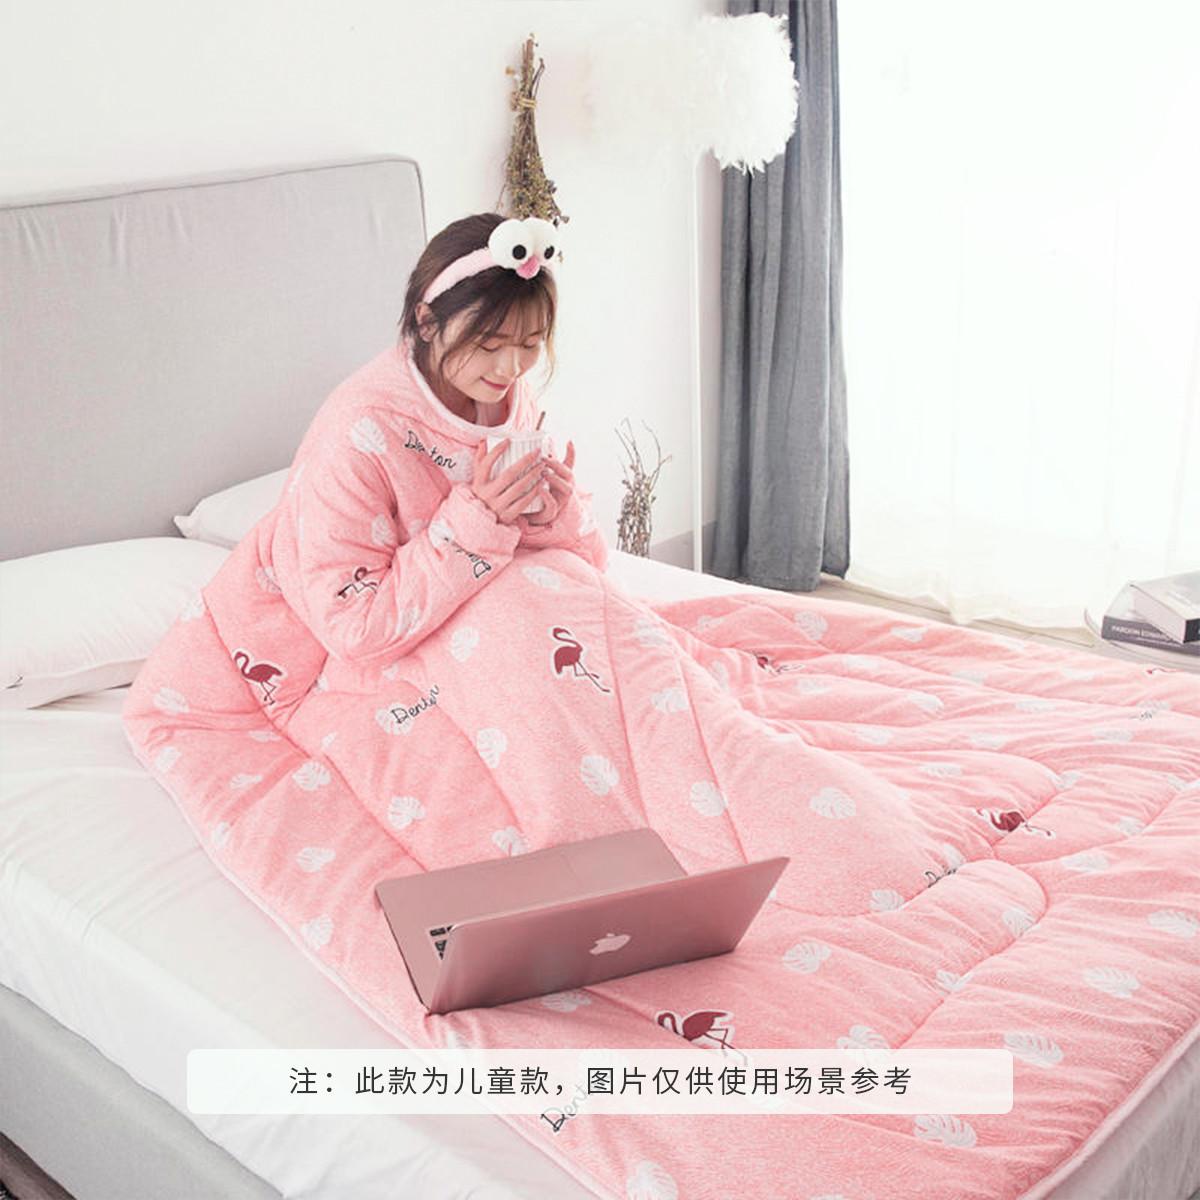 Ramada冬季保暖多功能带袖懒人被床上用品懒人被冬被被子被芯COLOR粉色